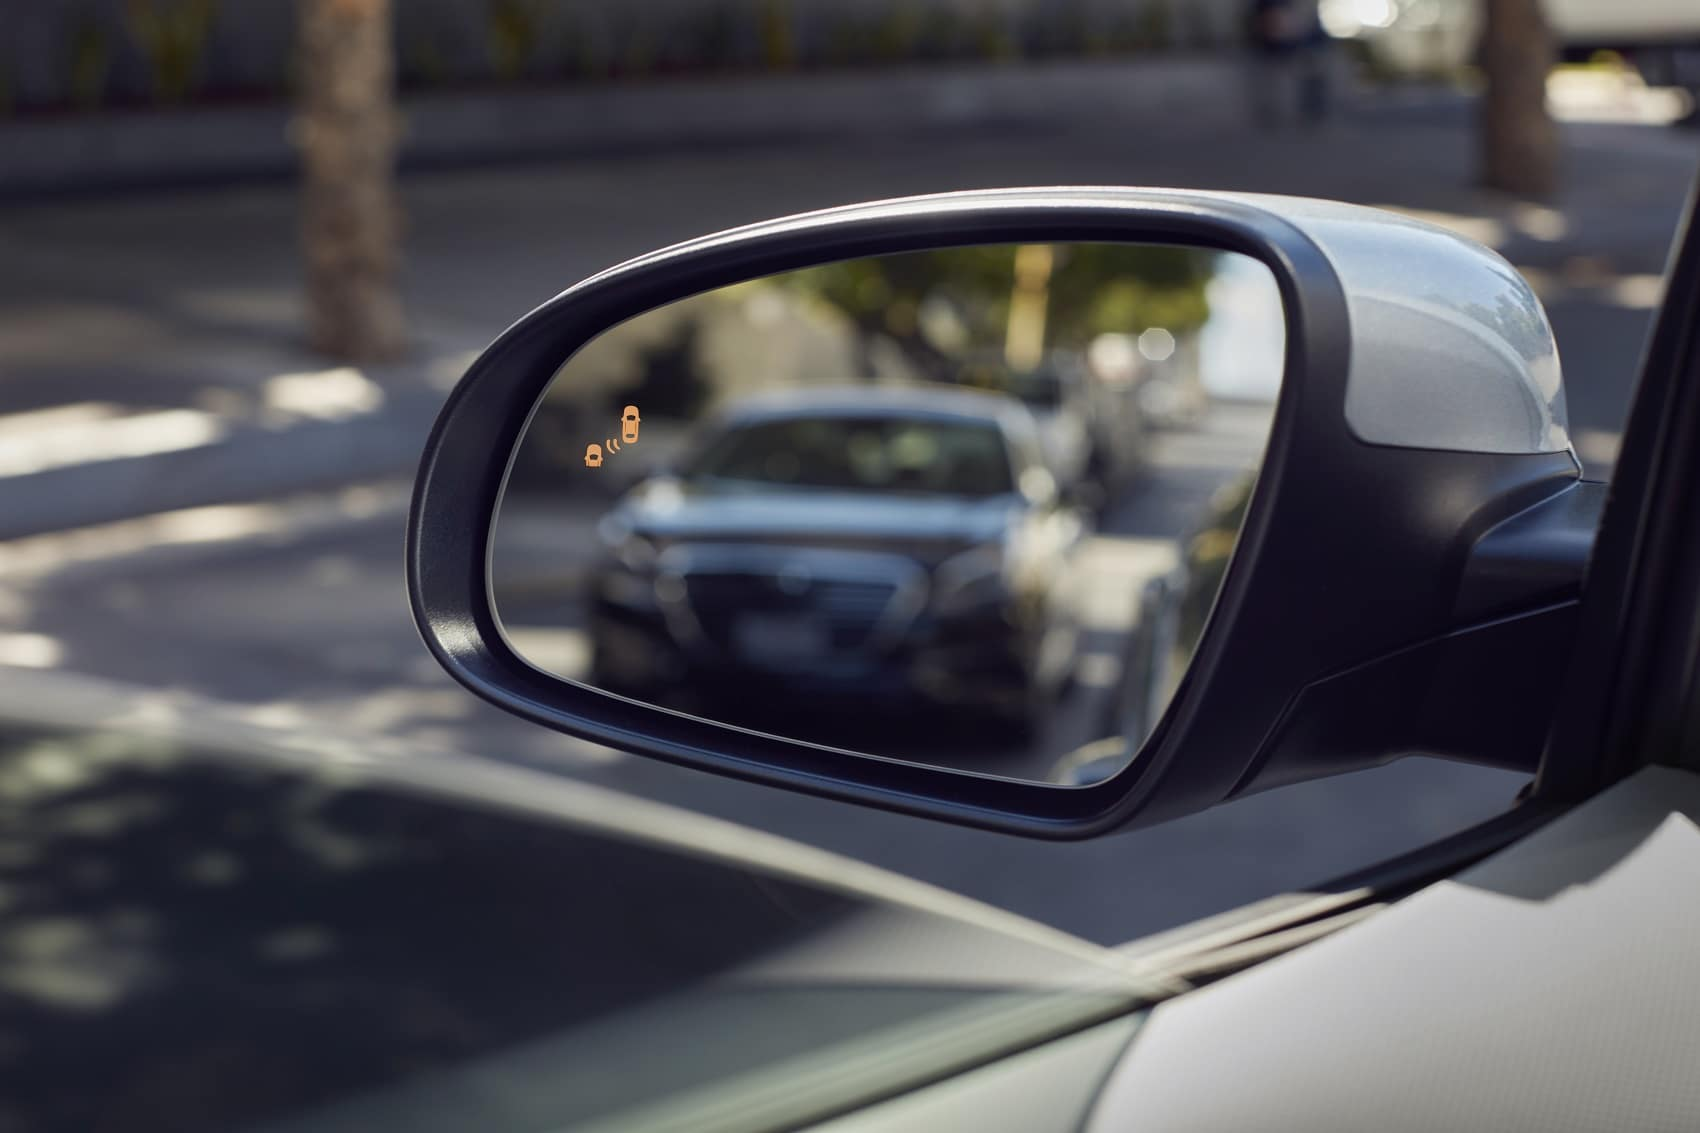 Hyundai Kona Safety Feature